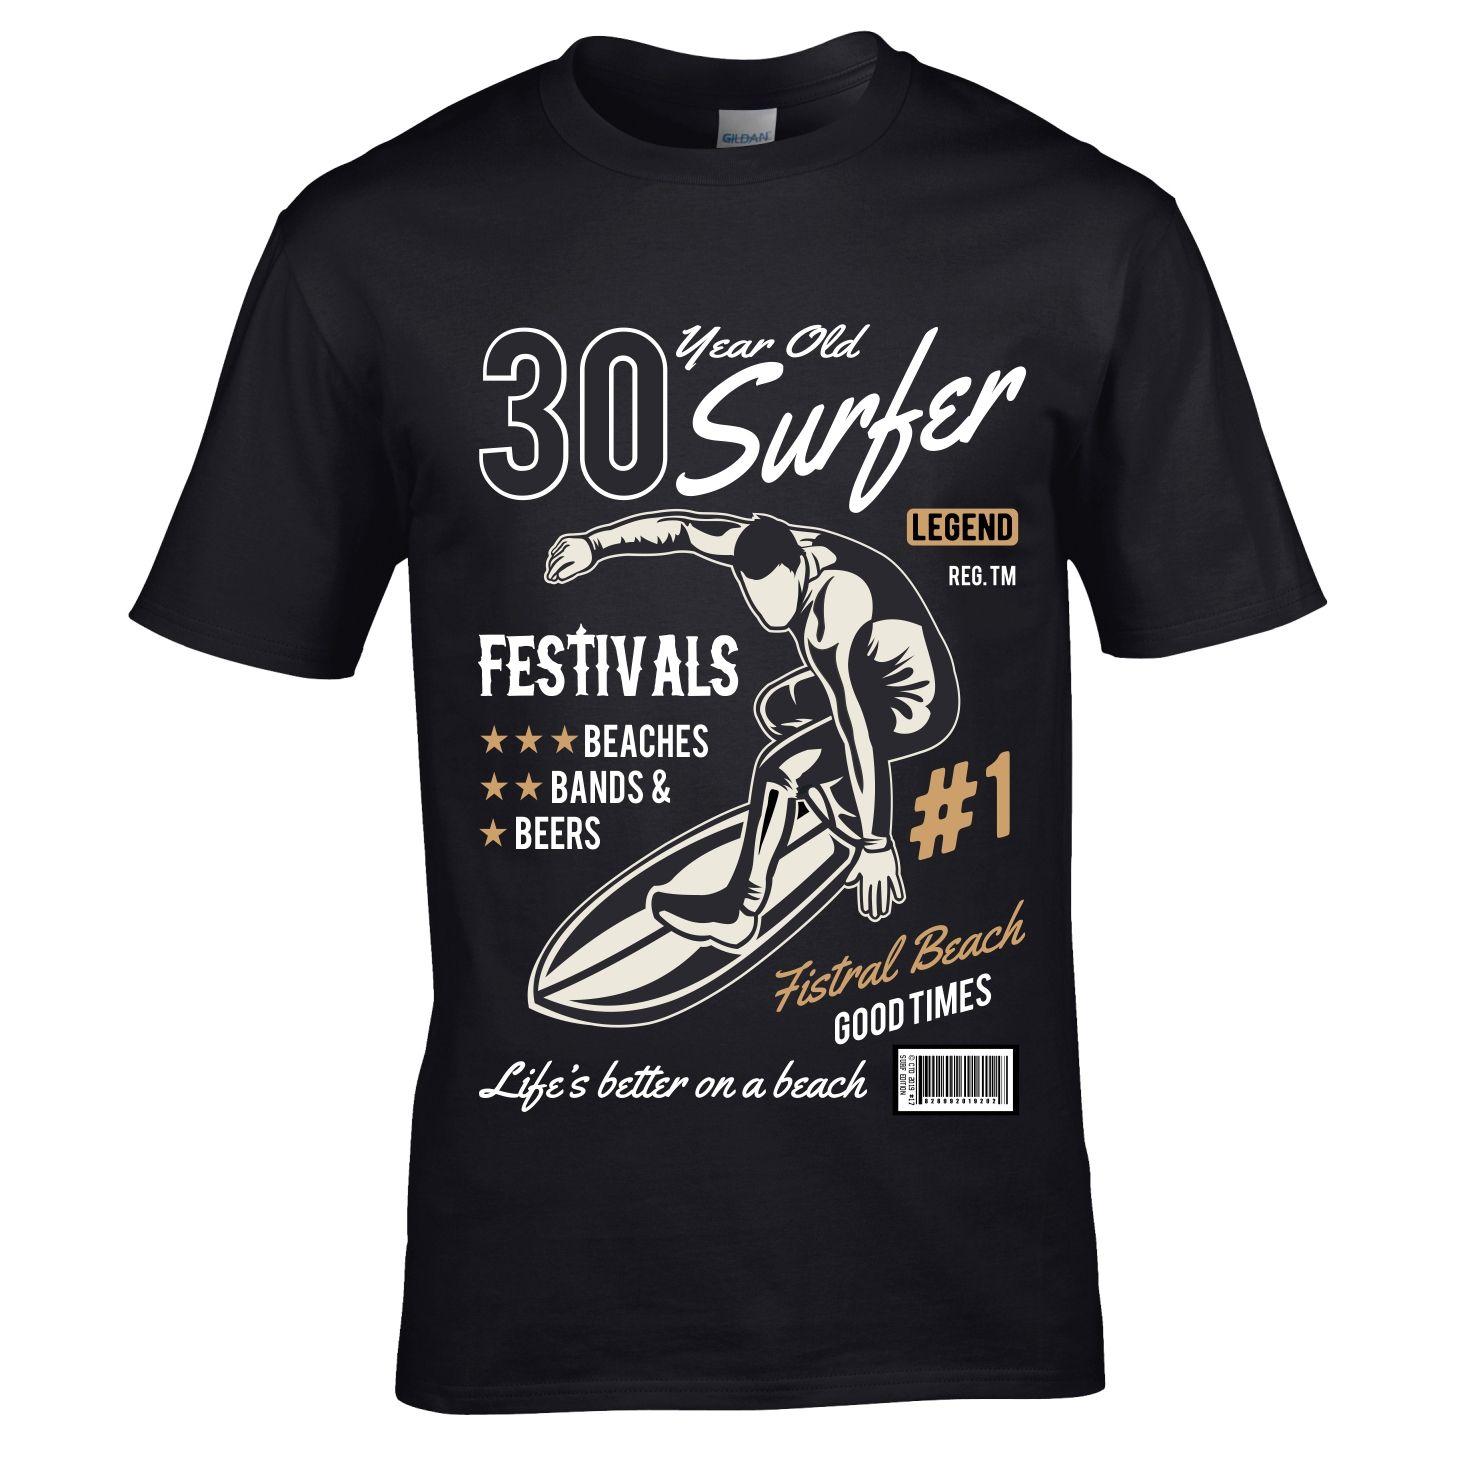 Premium 30 Year Old Surfer Beach Surfboard Motif For 30th Birthday Gift Mens Black T Shirt Top